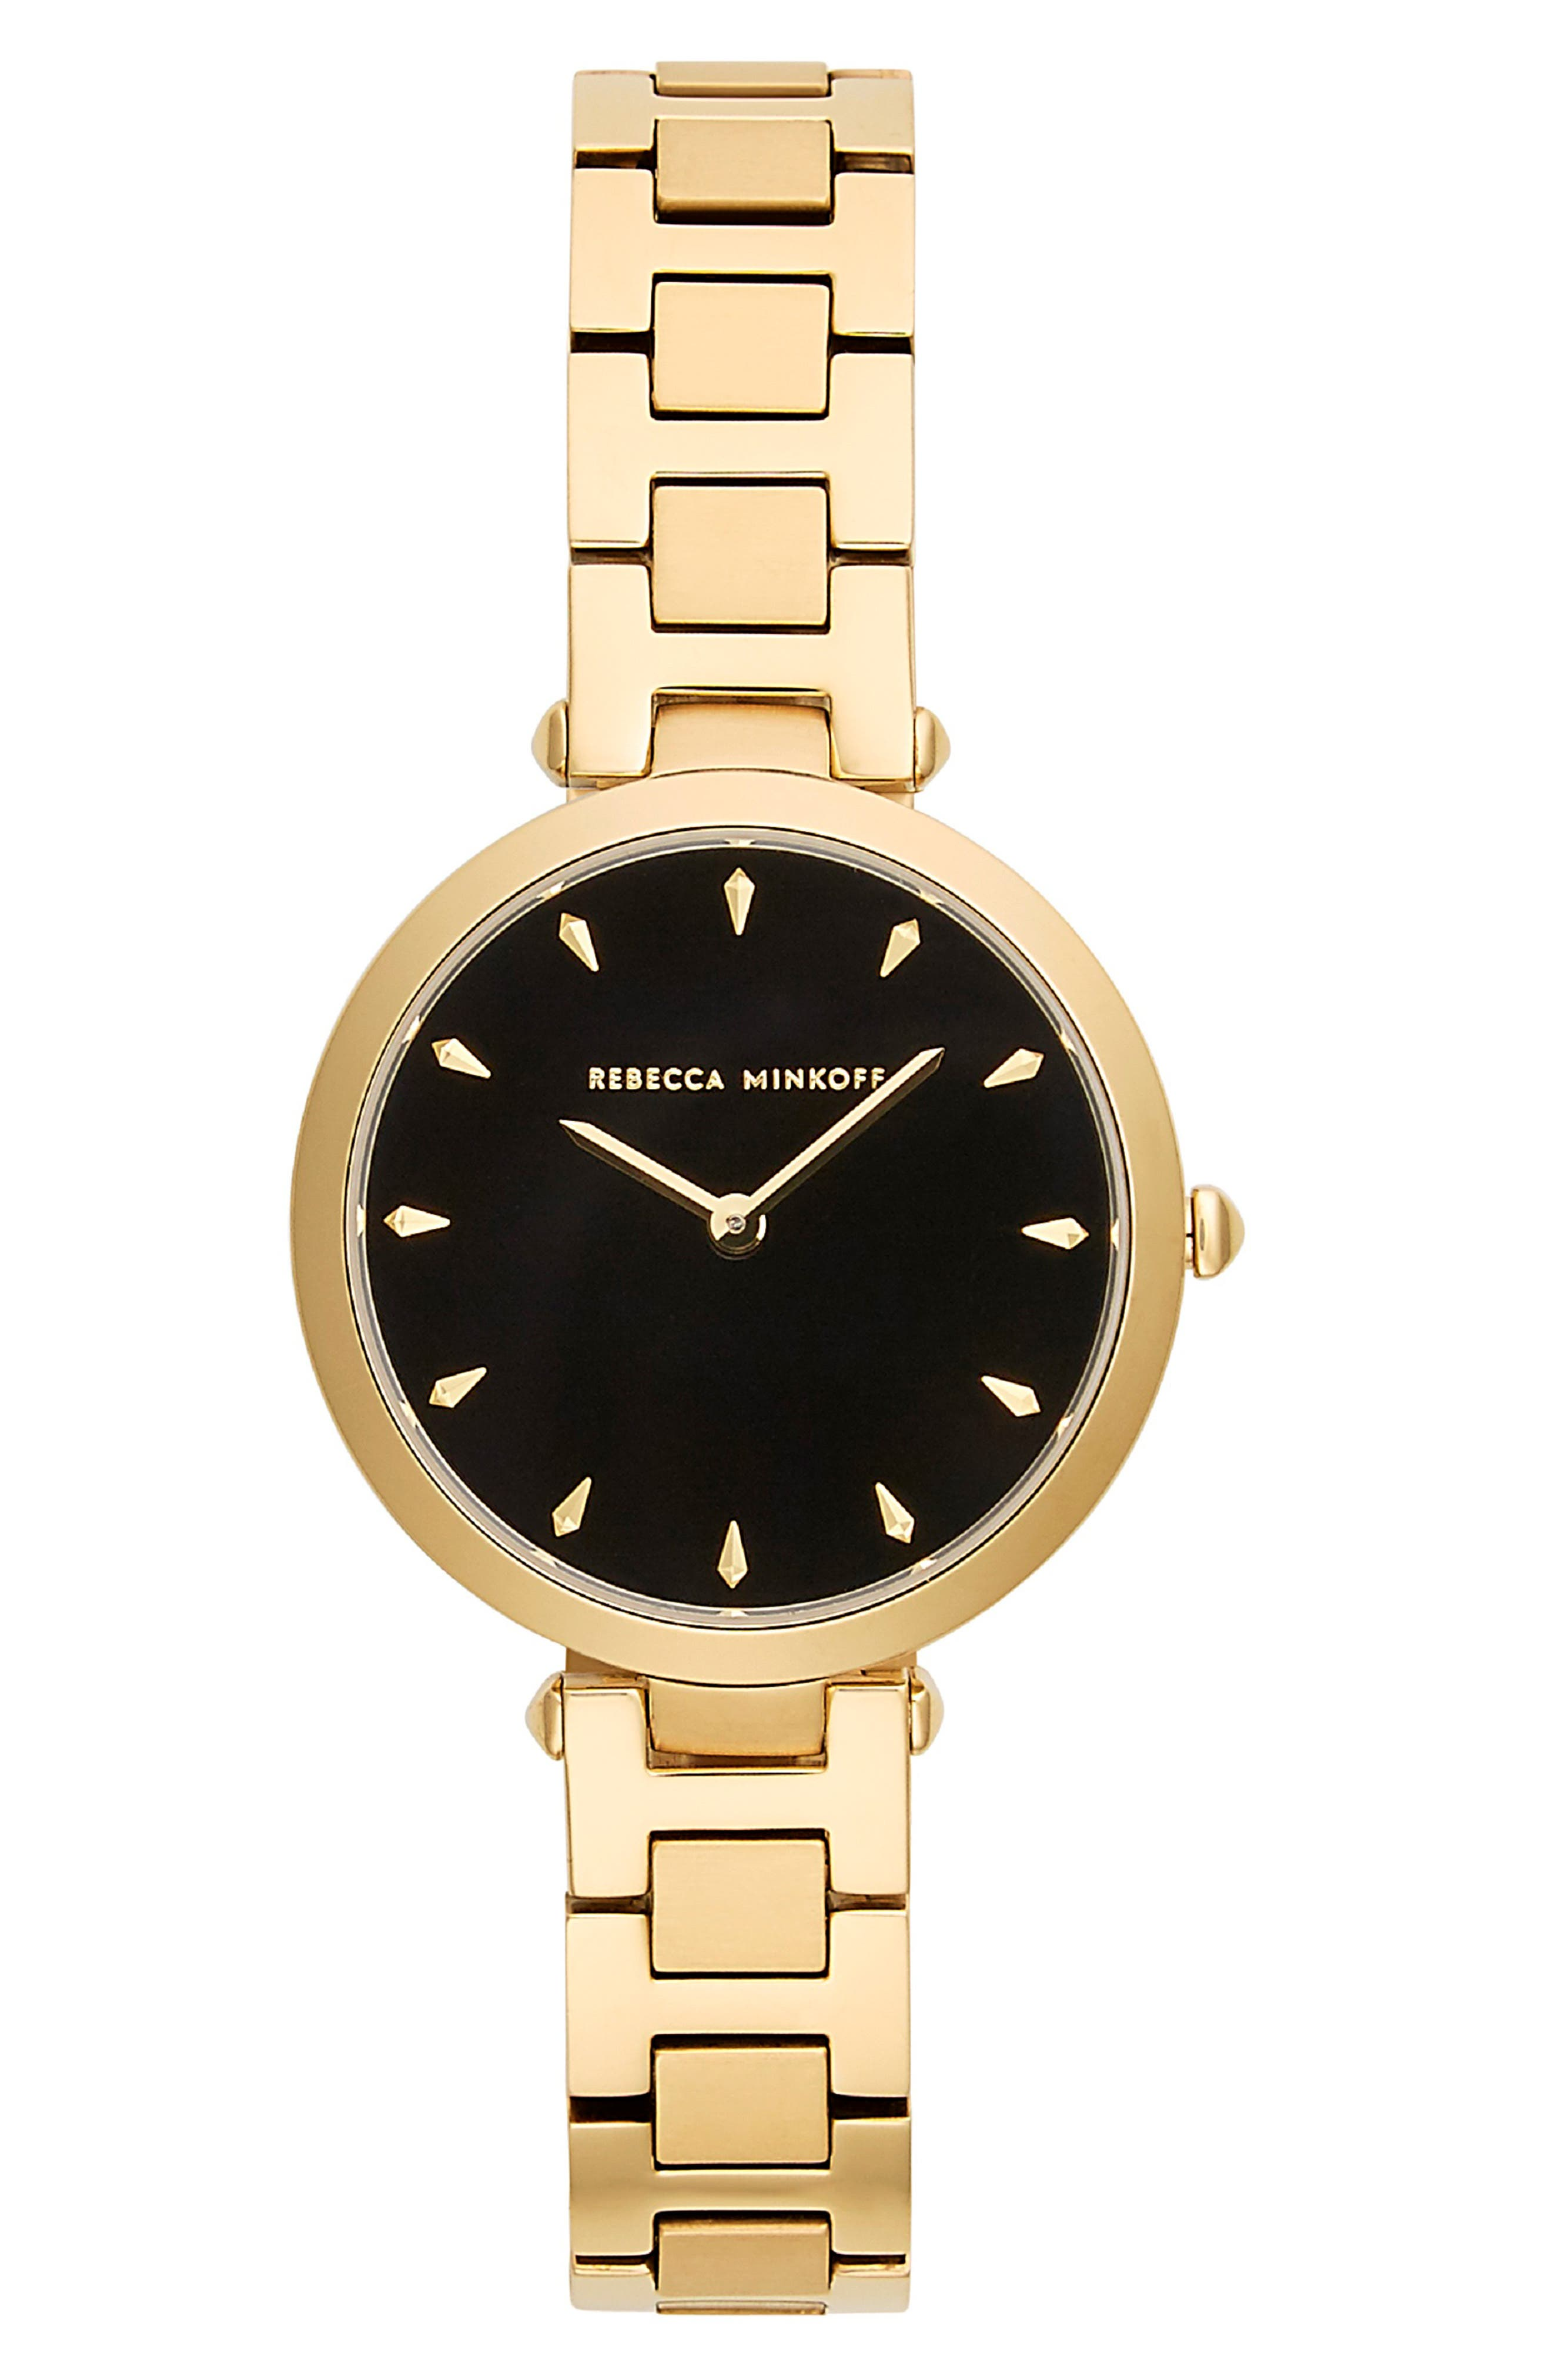 REBECCA MINKOFF, T-Bar Bracelet Strap Watch, 33mm, Main thumbnail 1, color, GOLD/ BLACK/ GOLD